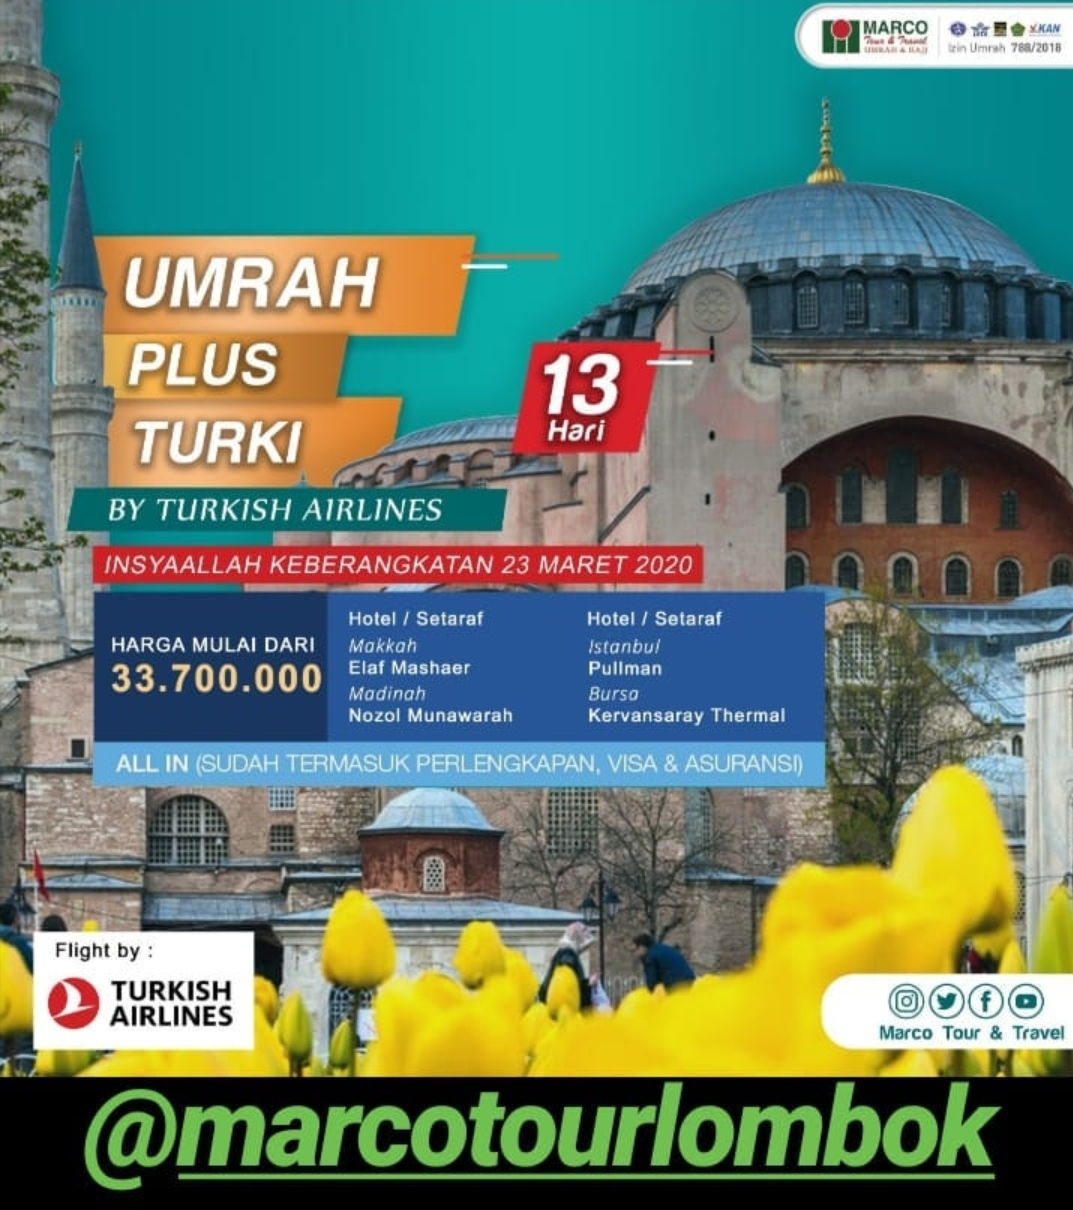 PAKET UMROH PLUS TURKI 13D